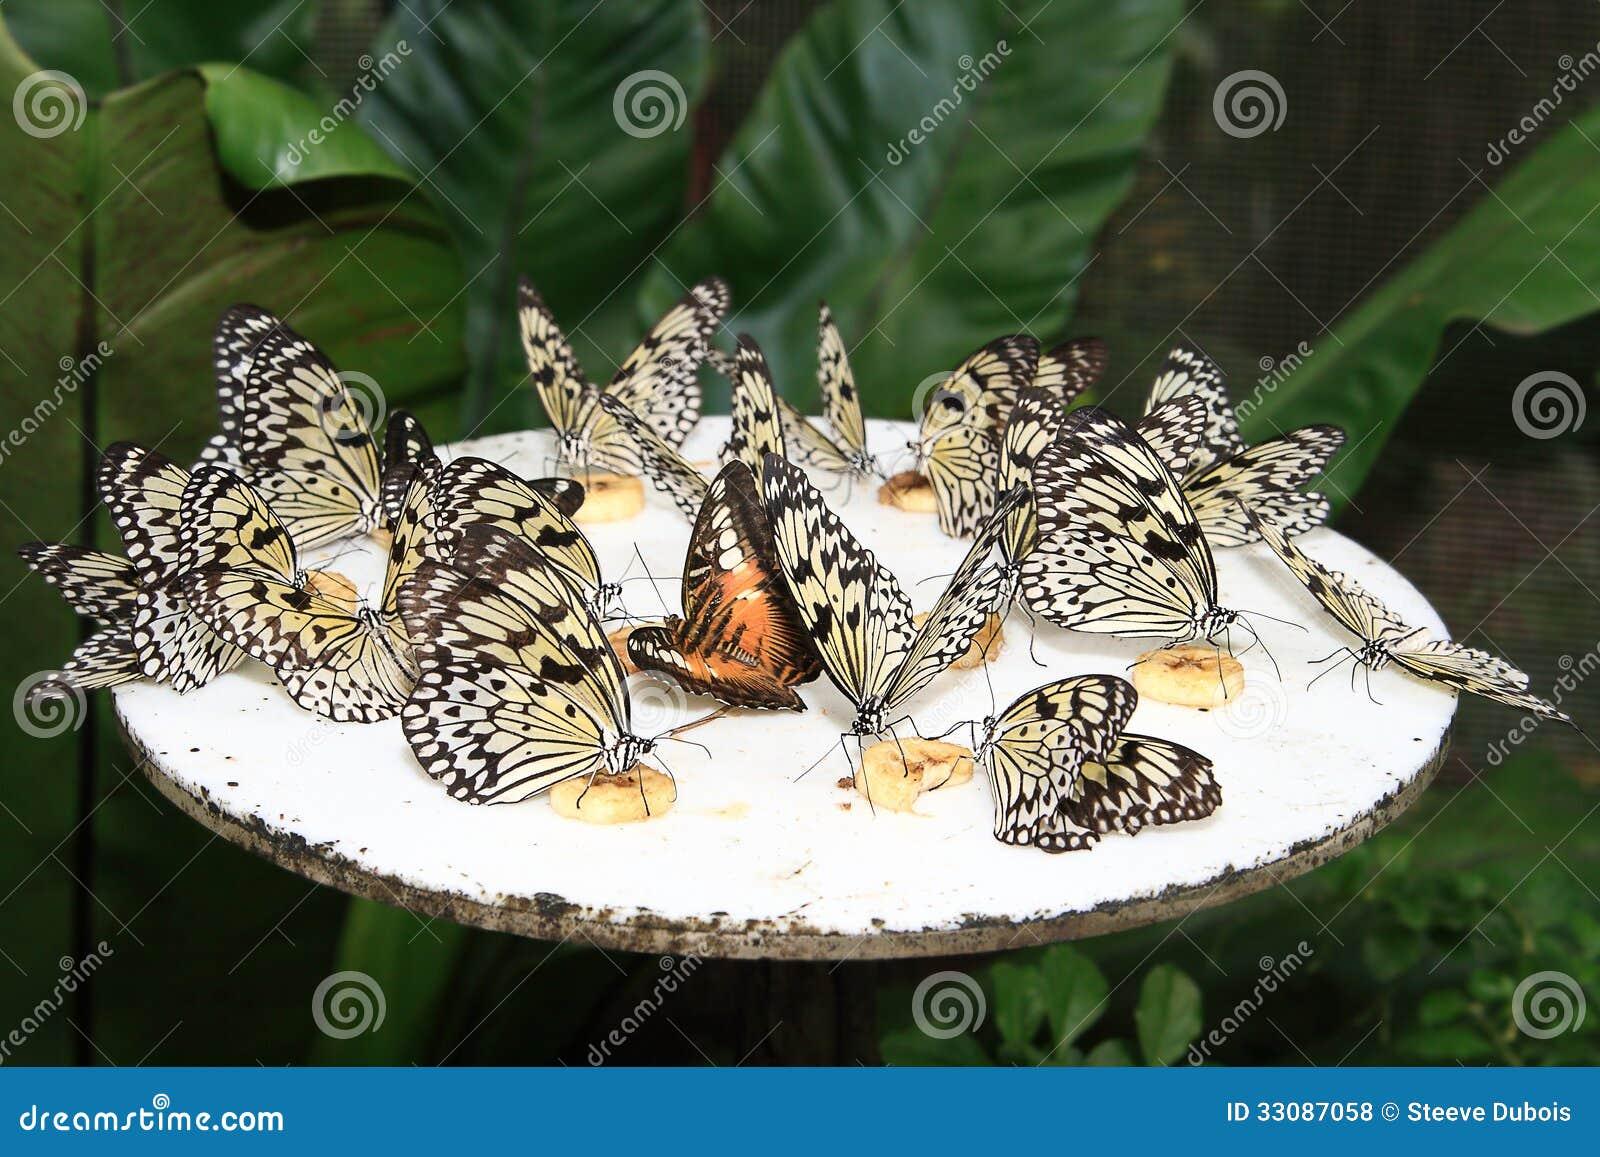 butterflies feeding on banana chunks royalty free stock